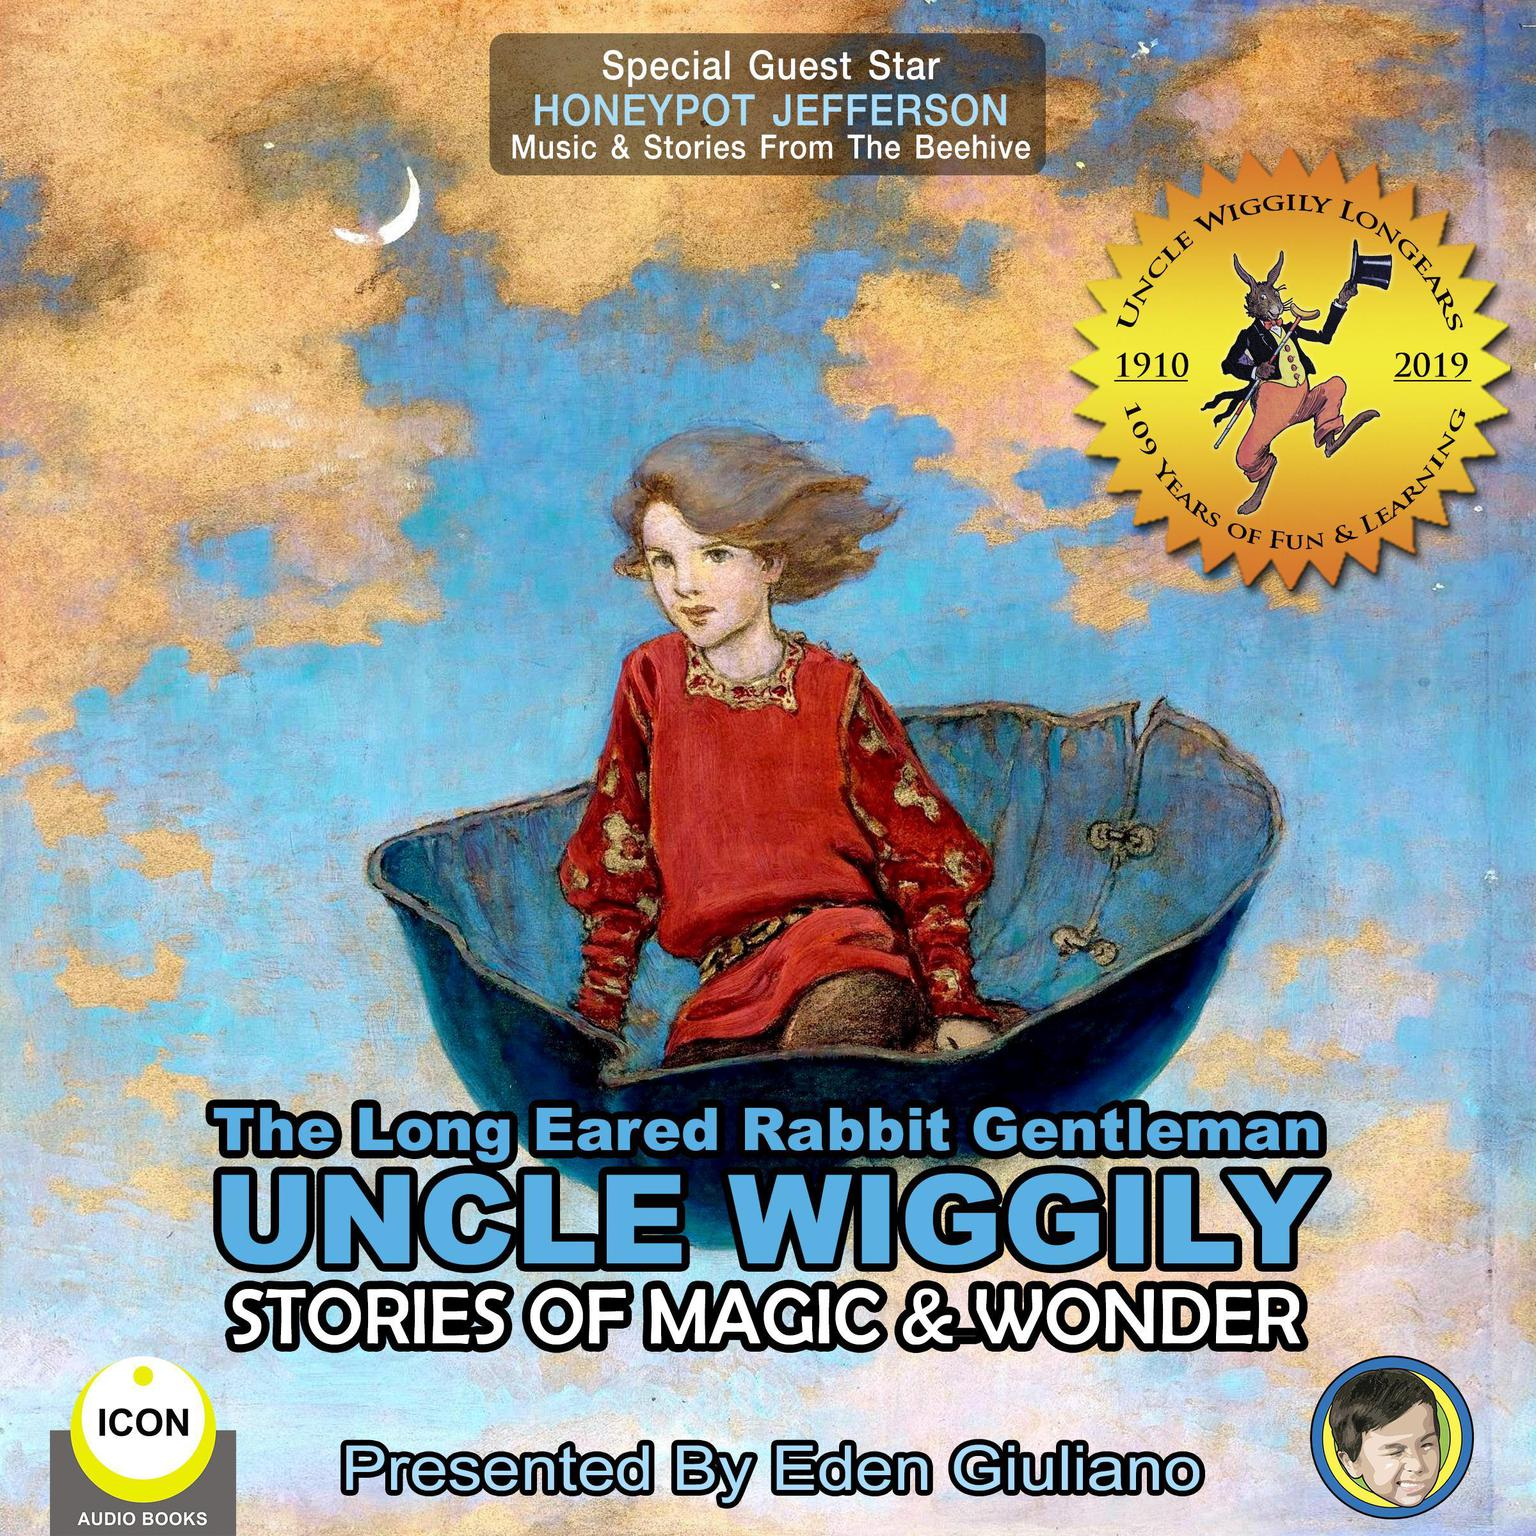 Printable The Long Eared Rabbit Gentleman Uncle Wiggily - Stories Of Magic & Wonder Audiobook Cover Art